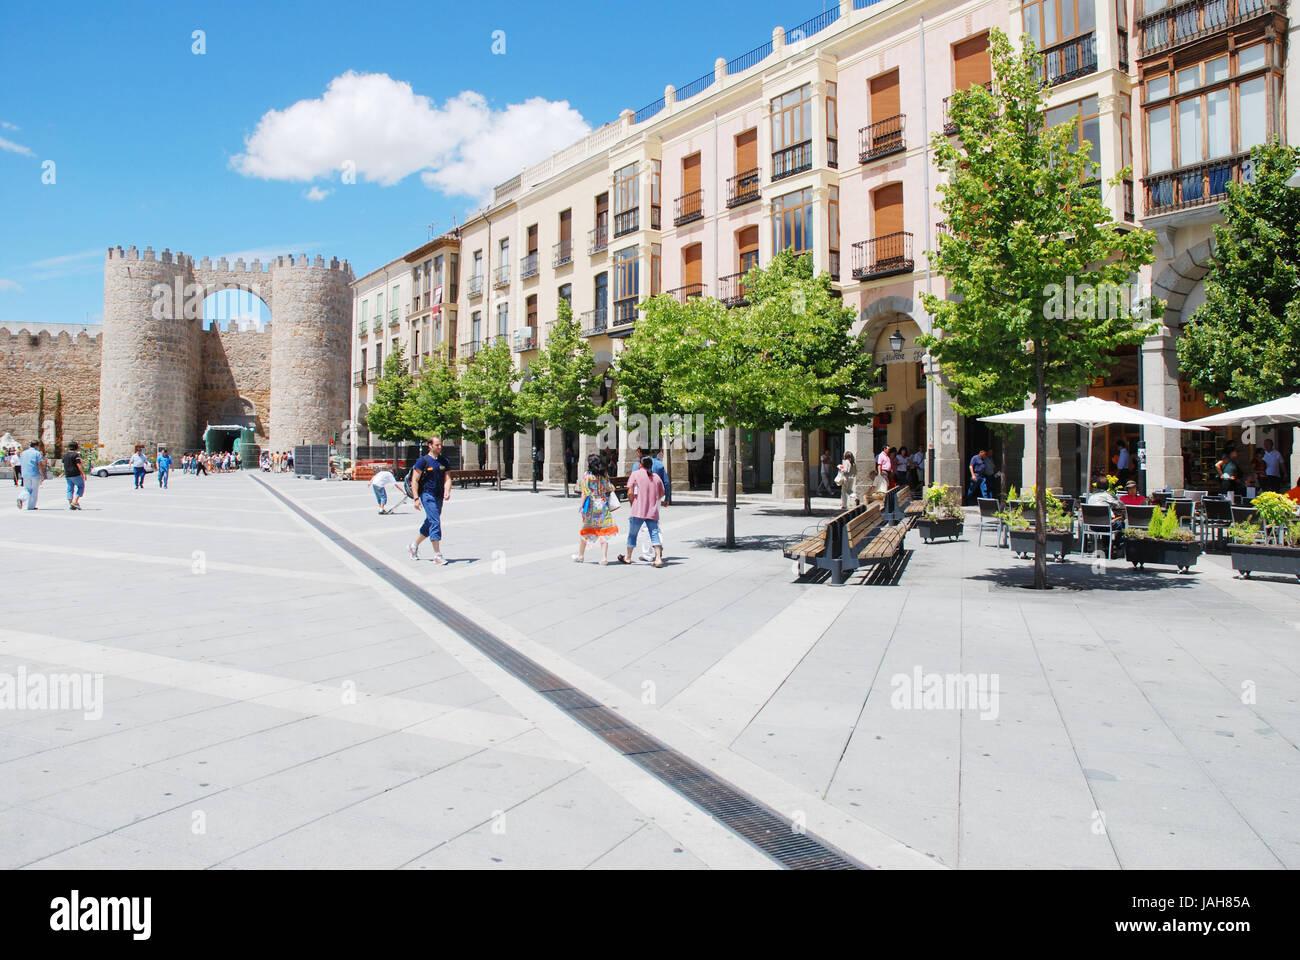 Plaza de Santa Teresa. Ávila, Castilla y León, España. Imagen De Stock